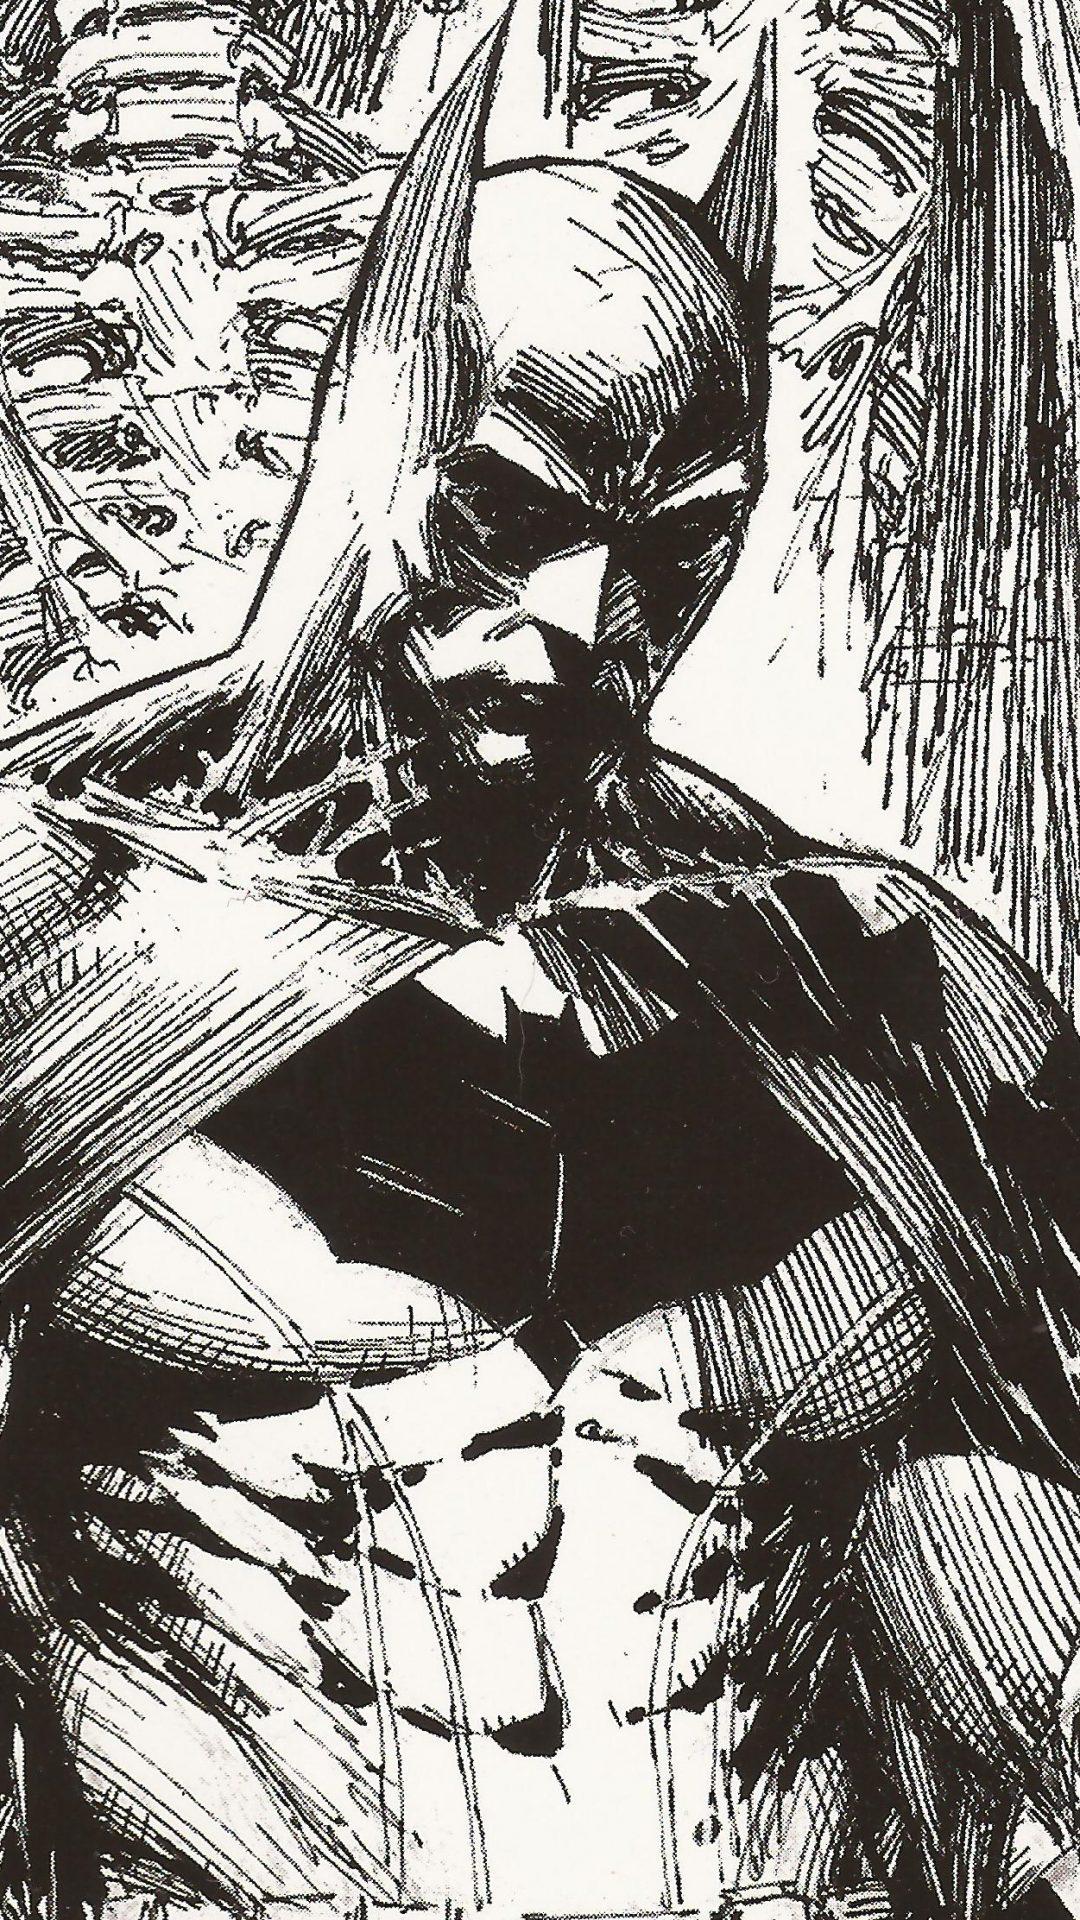 Batman Images Black And White Jpg